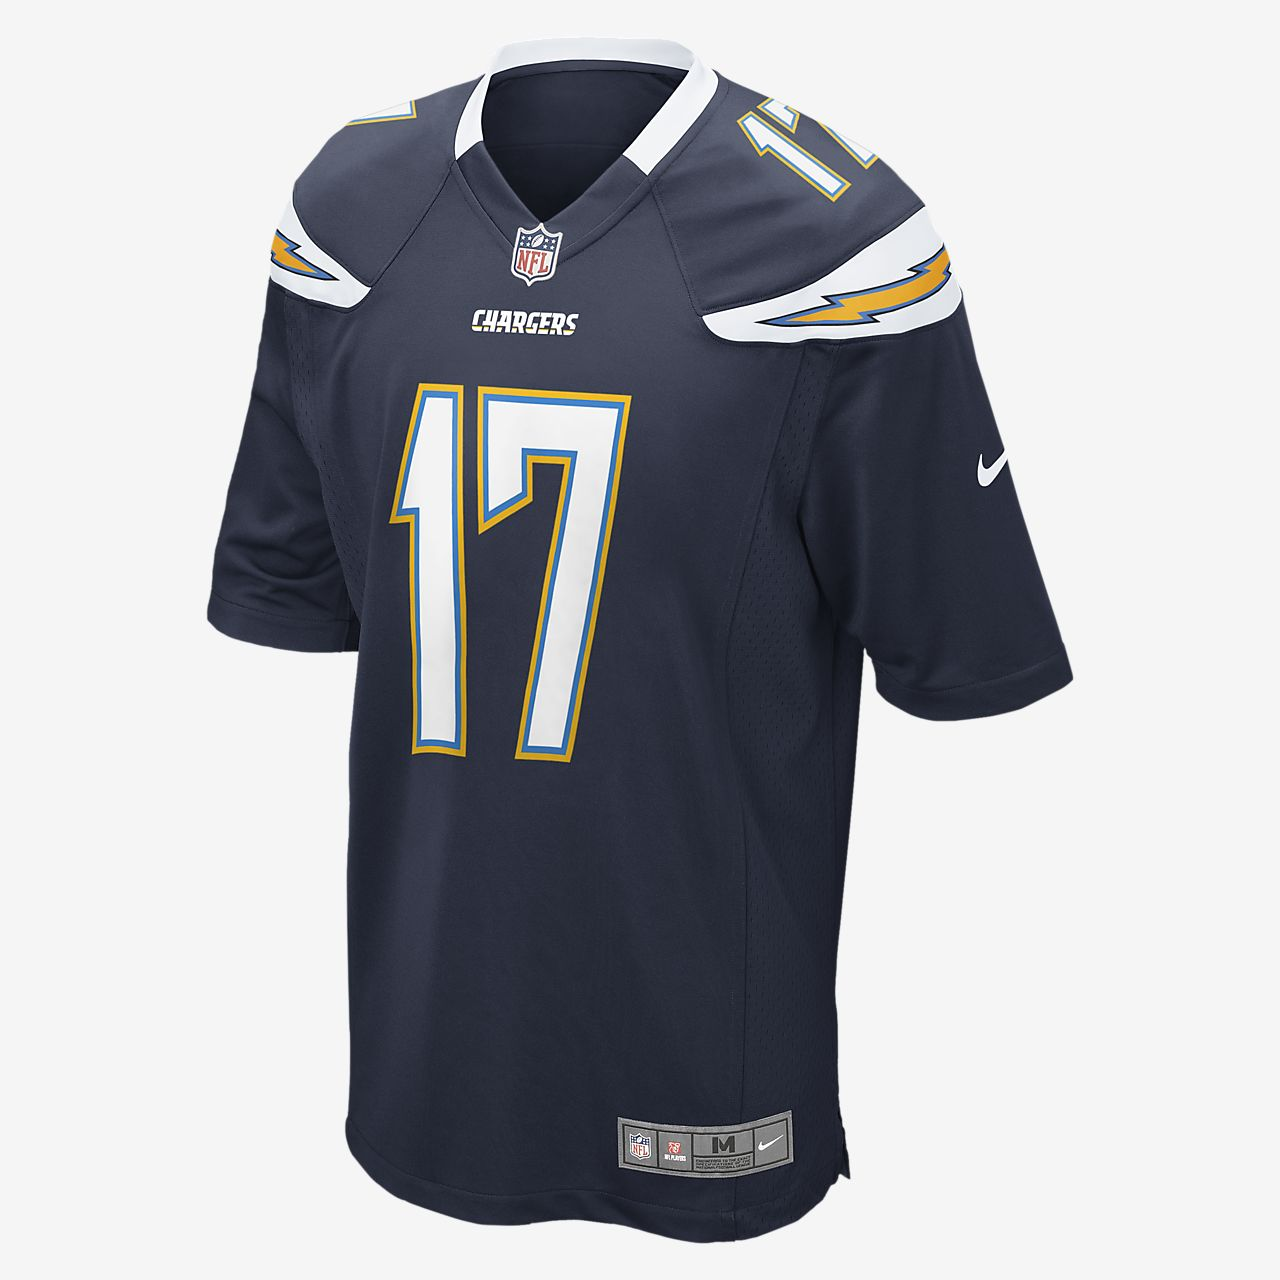 ... Camiseta oficial de fútbol americano de local para hombre NFL Los  Angeles Chargers (Philip Rivers 5c6d1373cf760